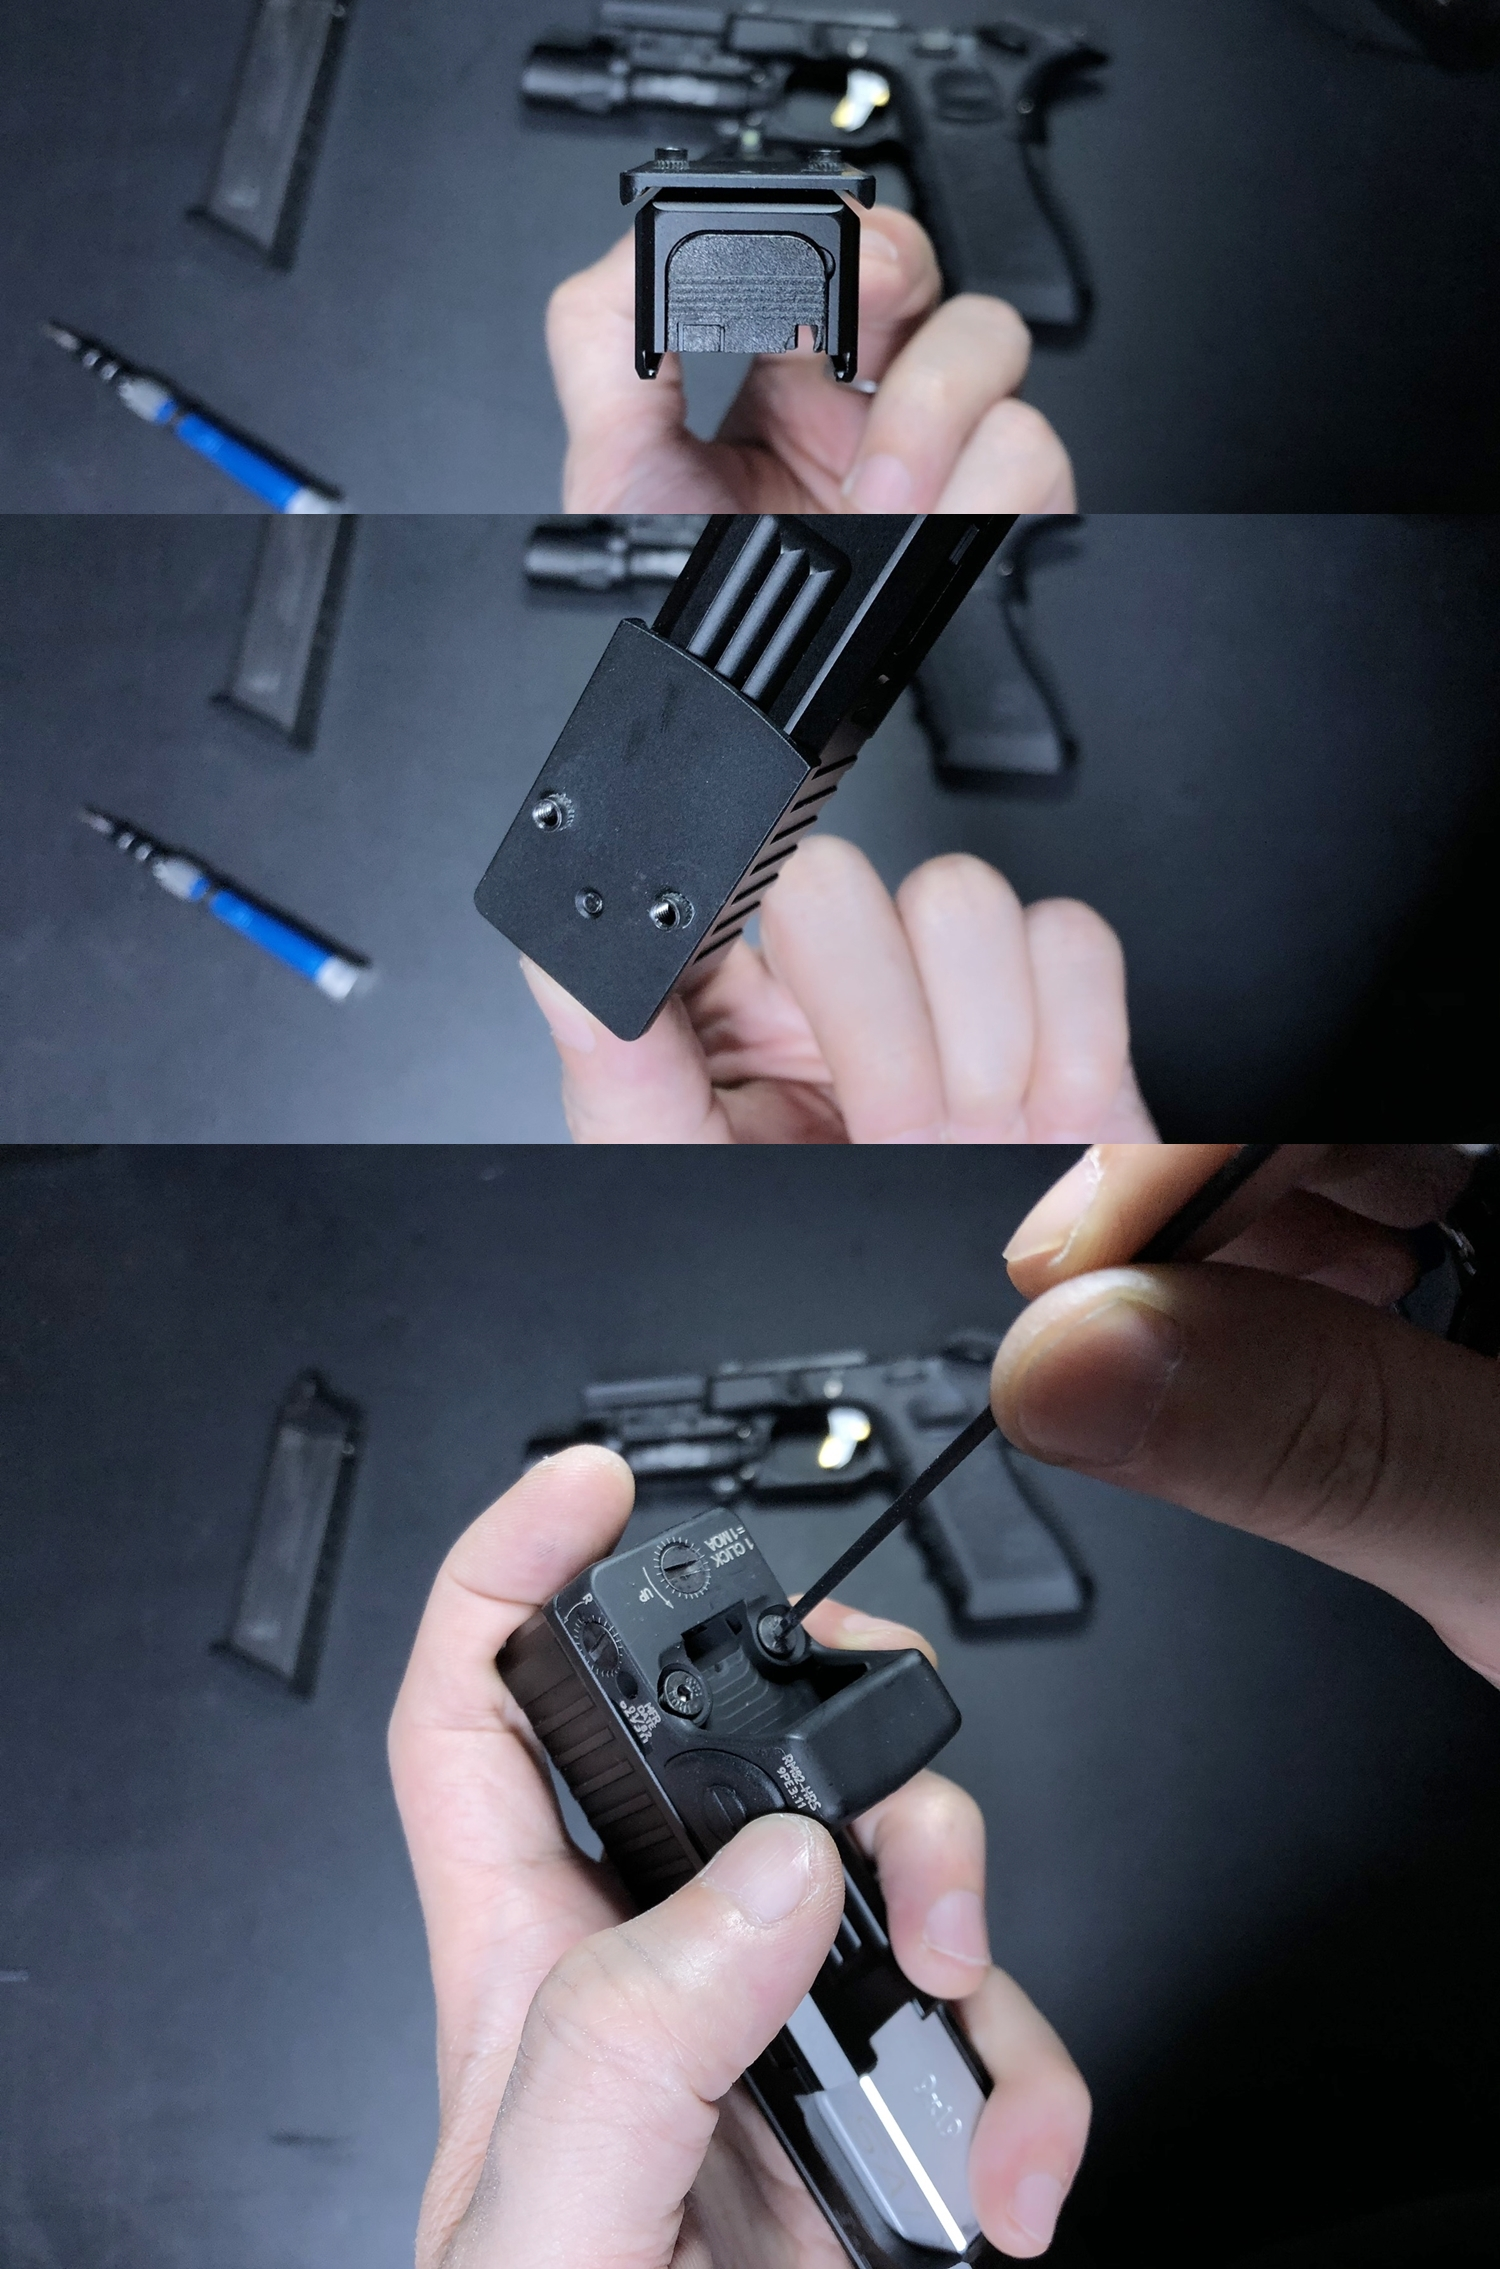 9 HolyWarrior製 RMR Trijicon Type ドットサイト GET!! 噂のHW製 最新 超軽量 複合材質 樹脂 タイプを購入したけど速攻で仲間に奪われました(笑)!! Glock G17 GBB カスタム!! 購入 開封 取付 加工 レビュー!!